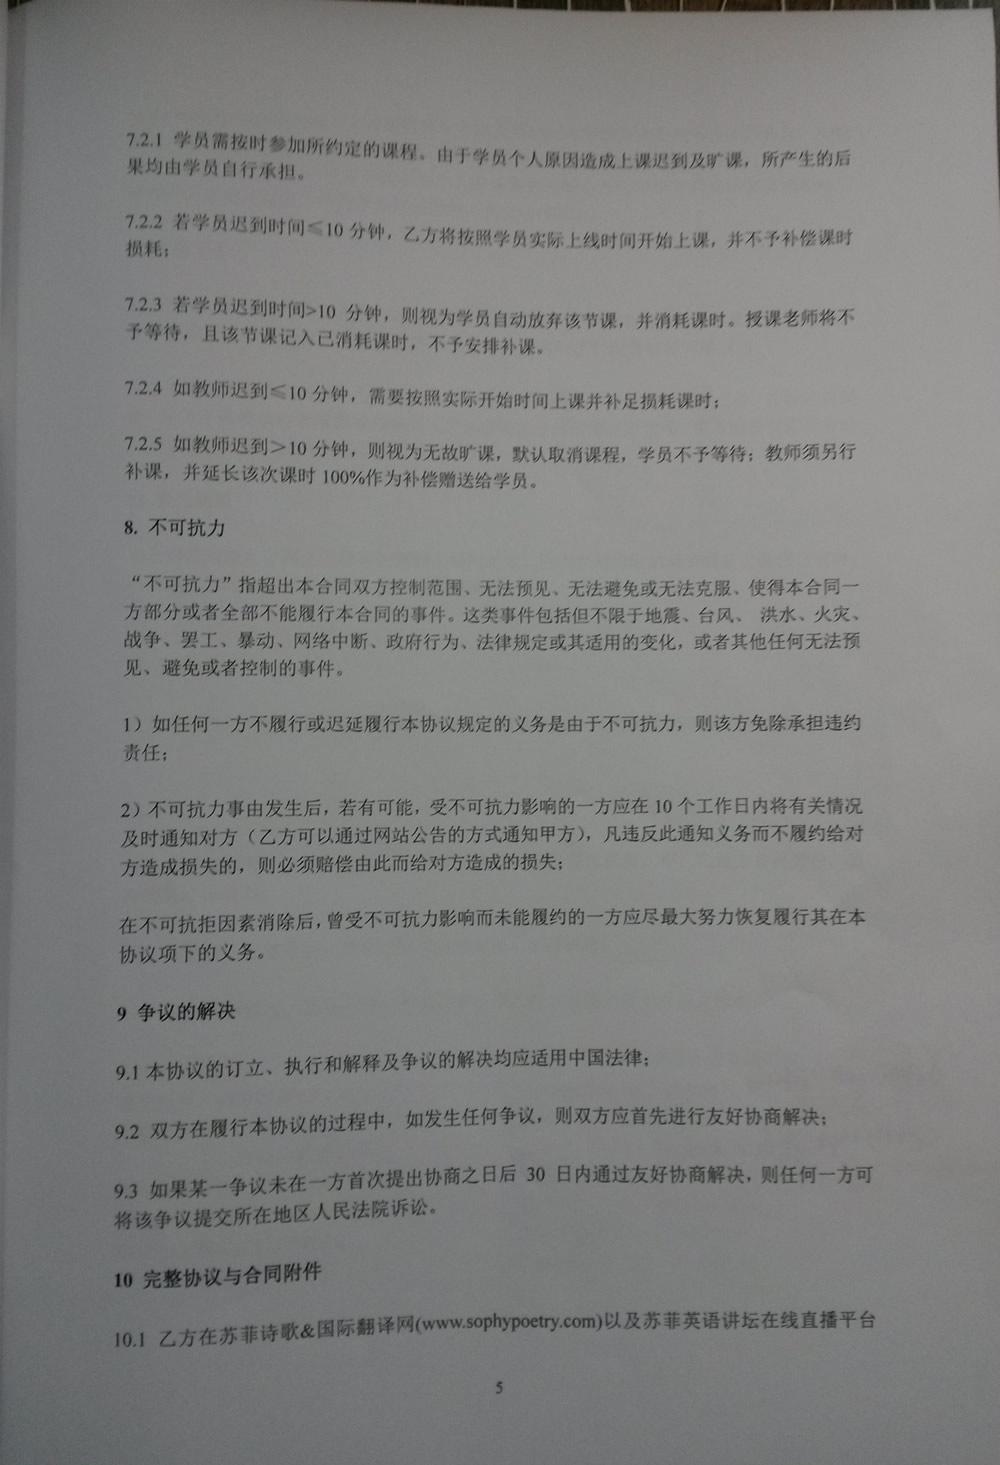 hetong1 苏菲英语讲坛录取通知书暨入学合同样本